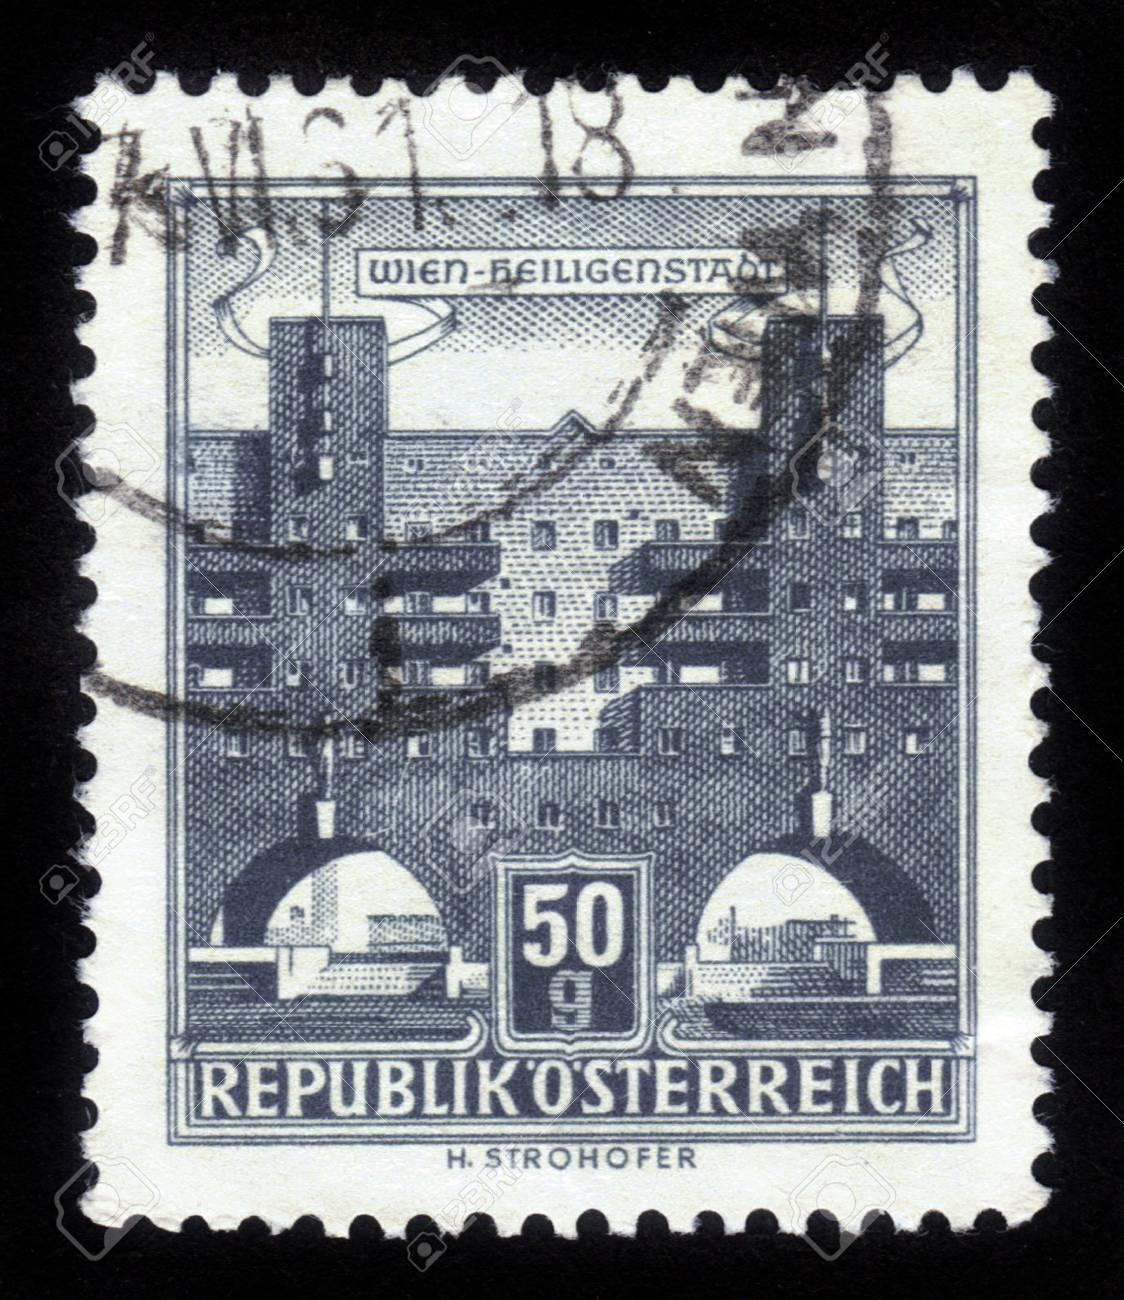 AUSTRIA - CIRCA 1962  A stamp printed in Austria shows Heiligenstadt, the 19th district of Vienna, circa 1962 Stock Photo - 14857929